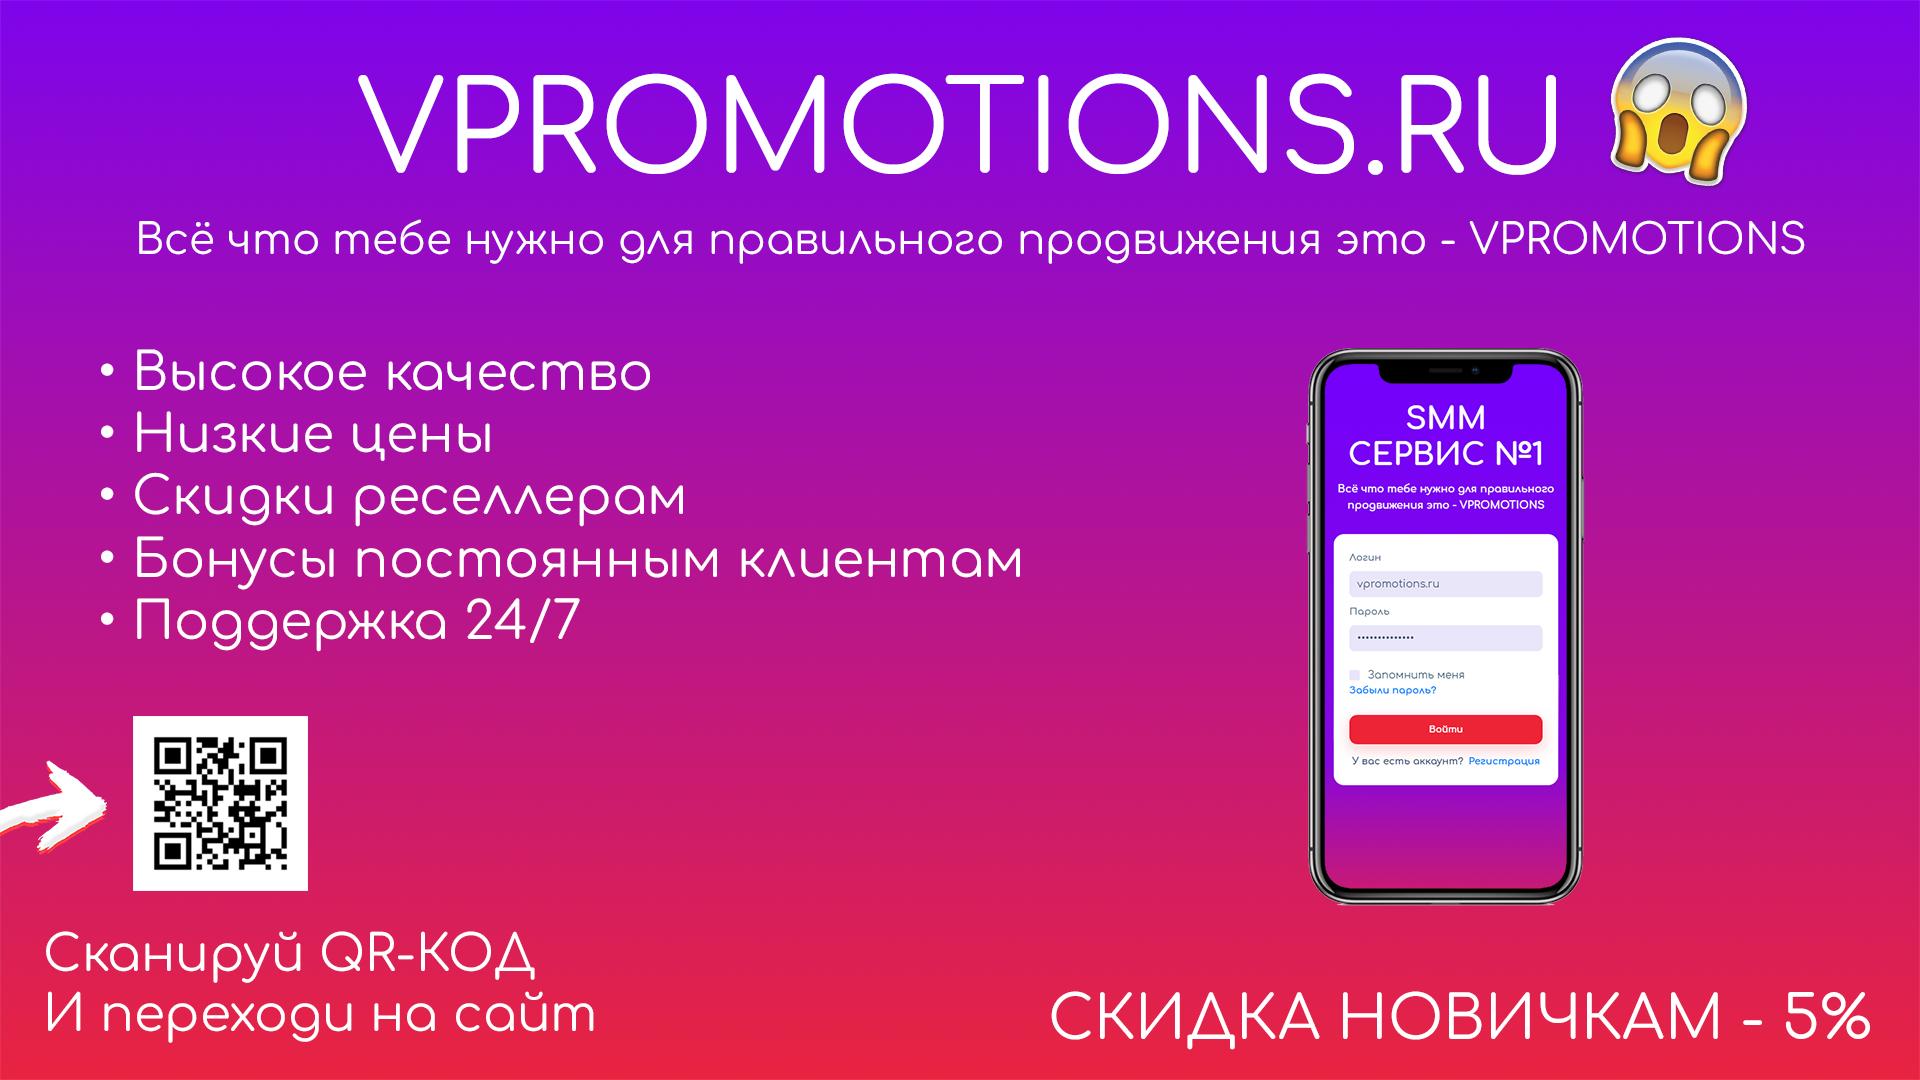 https://forumupload.ru/uploads/0000/35/39/247816/737989.png